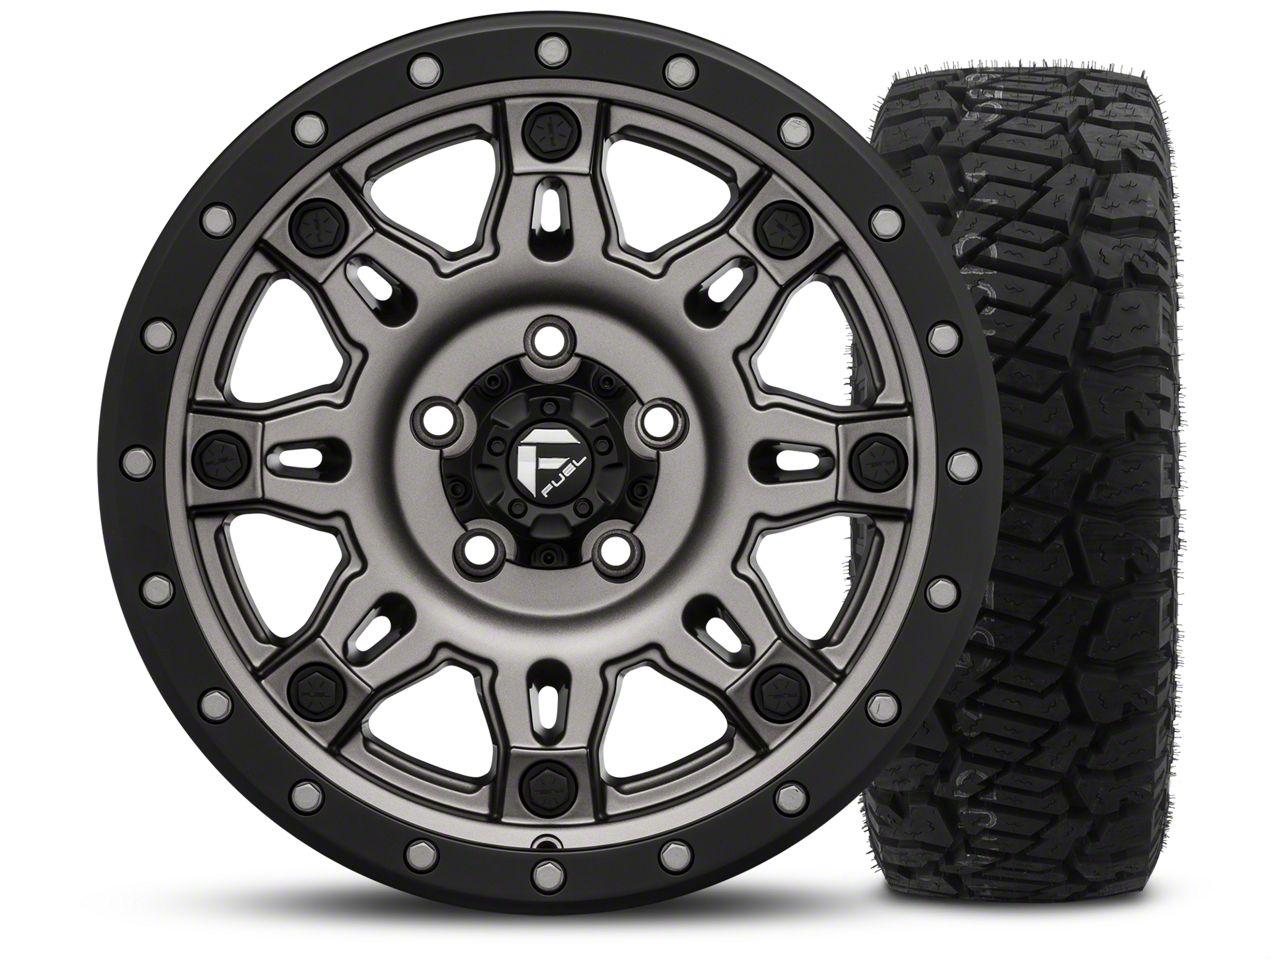 Fuel Wheels Hostage III Gunmetal and Black - 17x9 Wheel - and Dick Cepek Fun Country Tire - 315/70R17 (07-18 Jeep Wrangler JK; 2018 Jeep Wrangler JL)